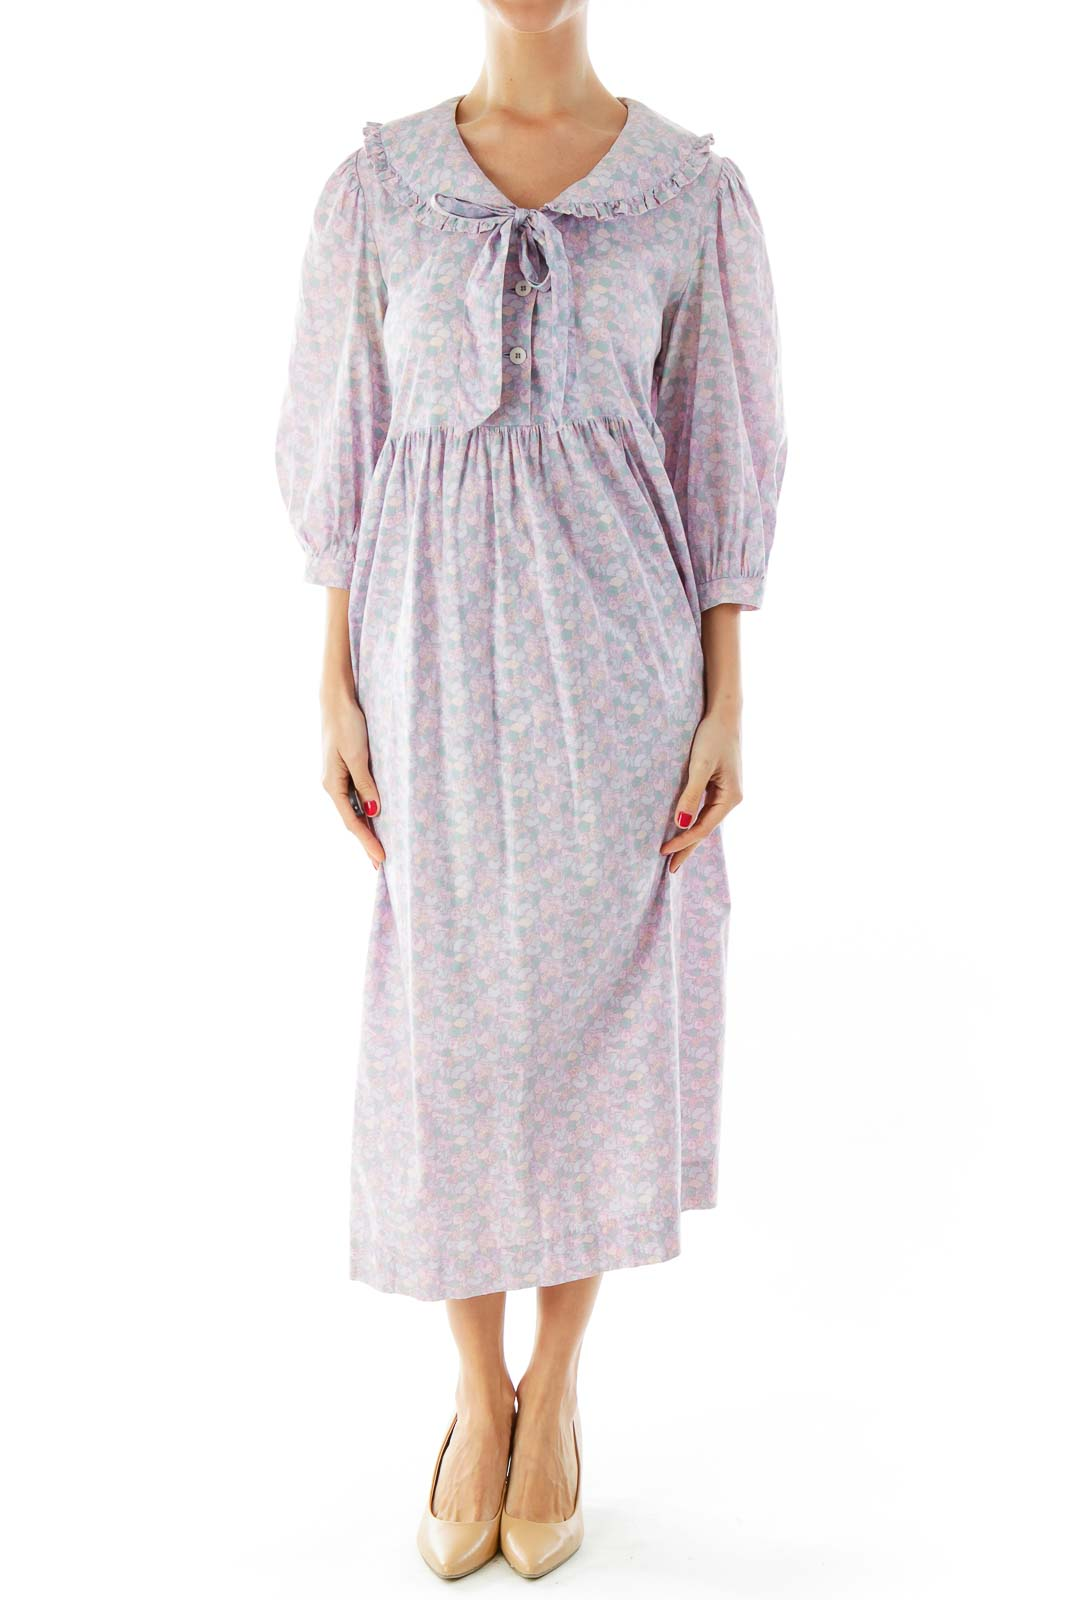 Lavender Floral Midi Dress Front